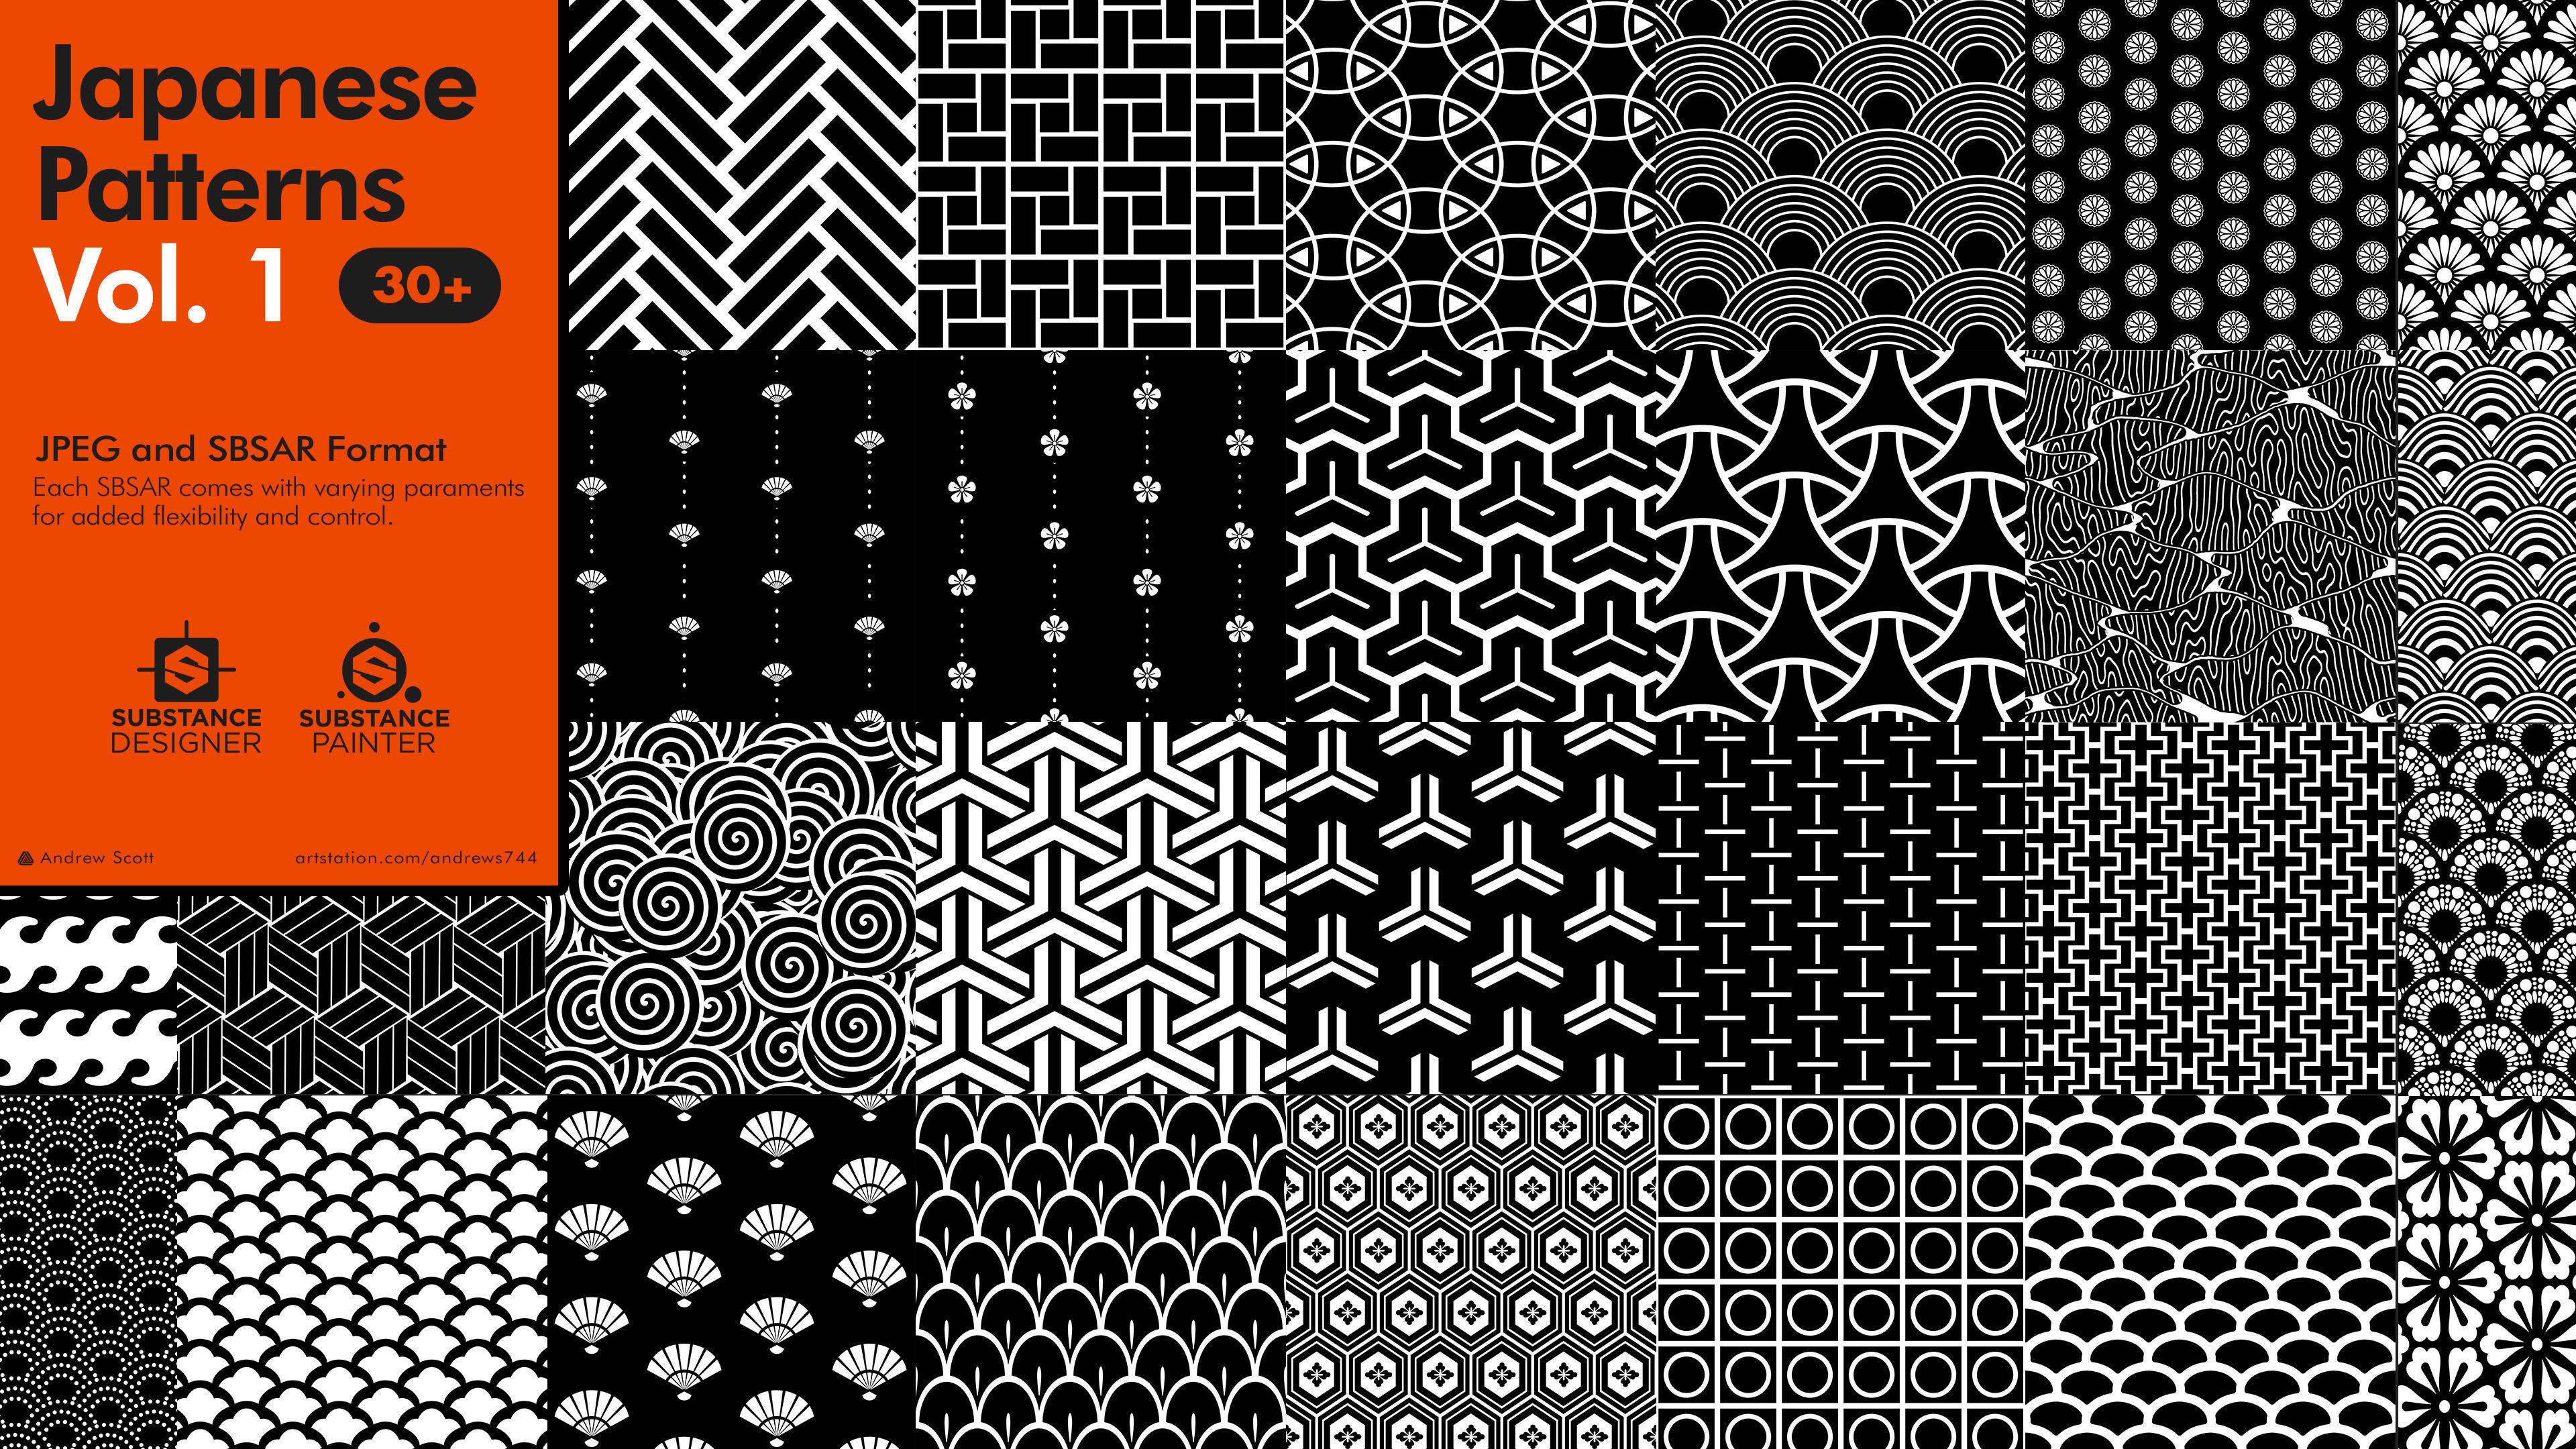 Japanese Patterns Vol 1